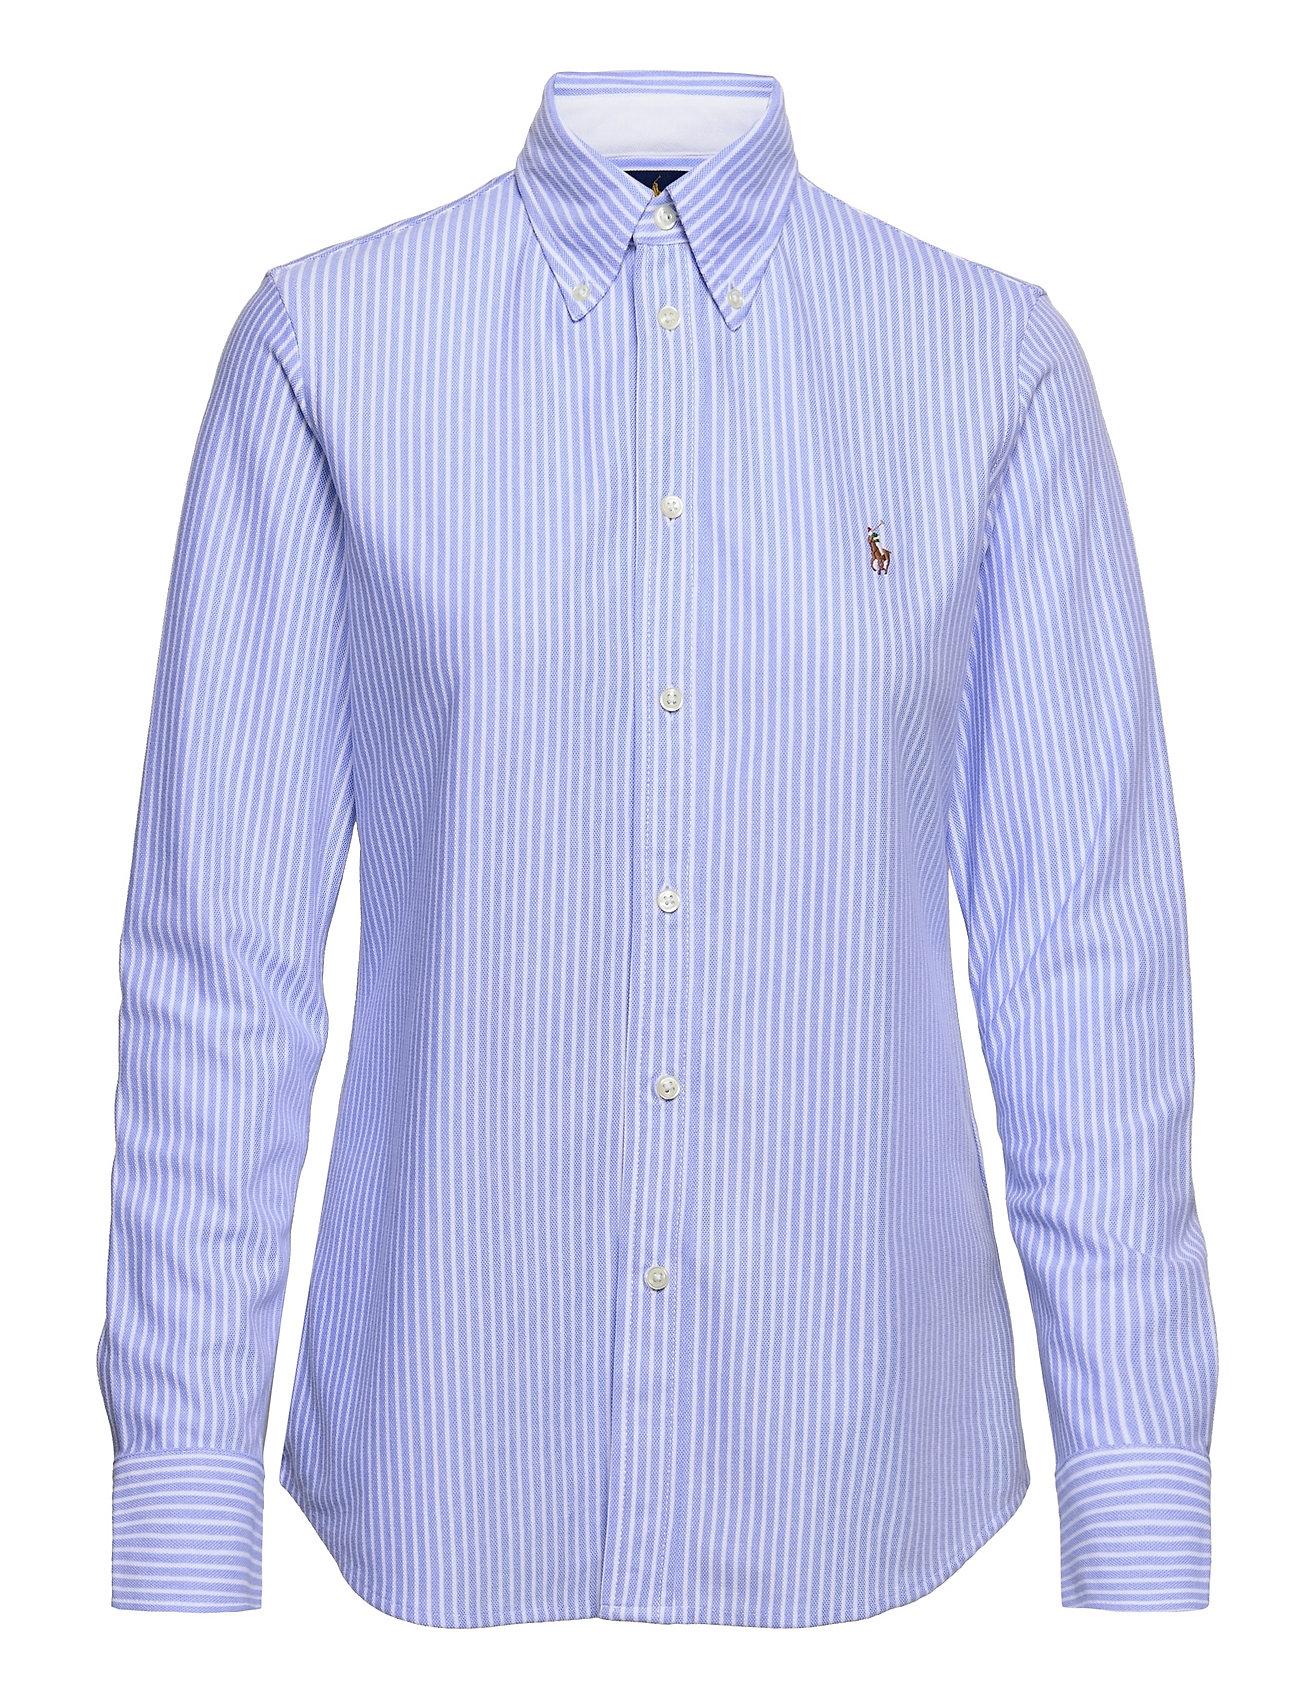 Polo Ralph Lauren Striped Knit Oxford Shirt - HARBOR ISLAND BLUE